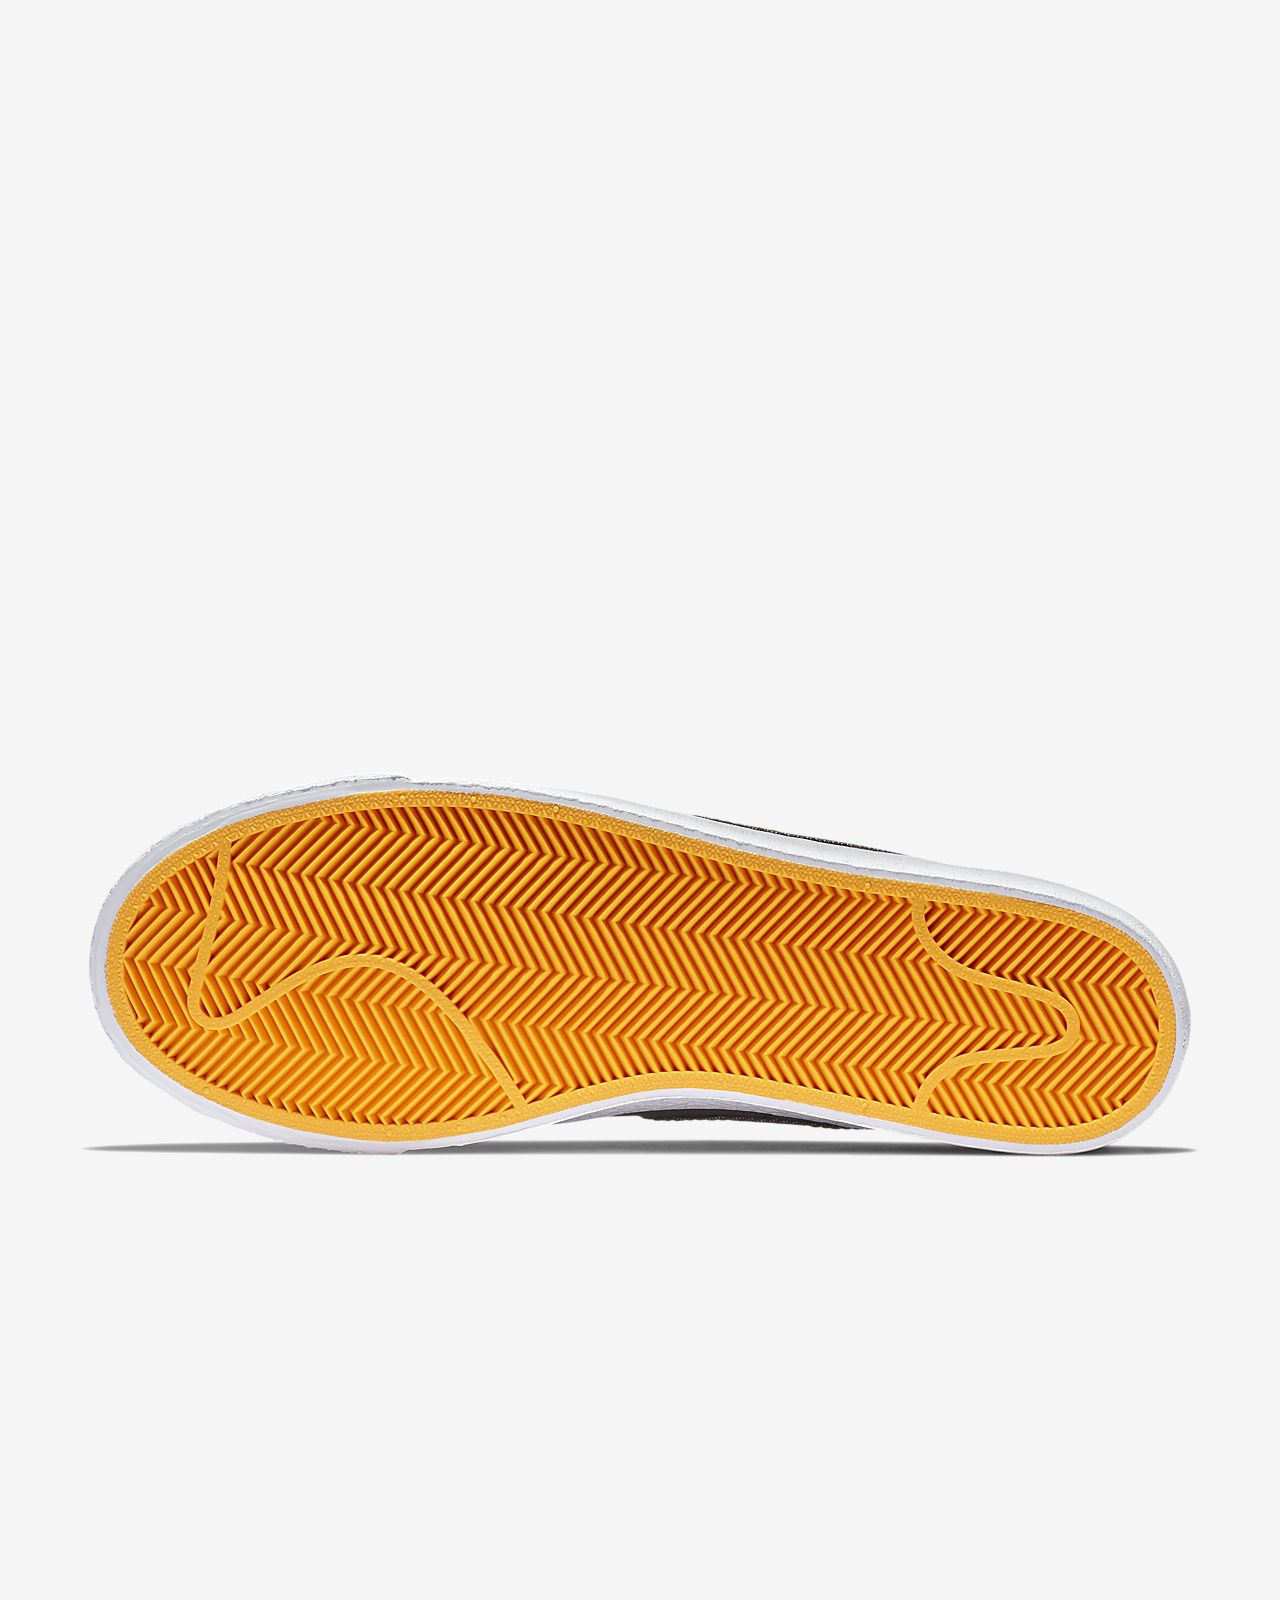 100% authentic c243a cd18b Nike SB Zoom Blazer Low Canvas Deconstructed Men's Skateboarding Shoe